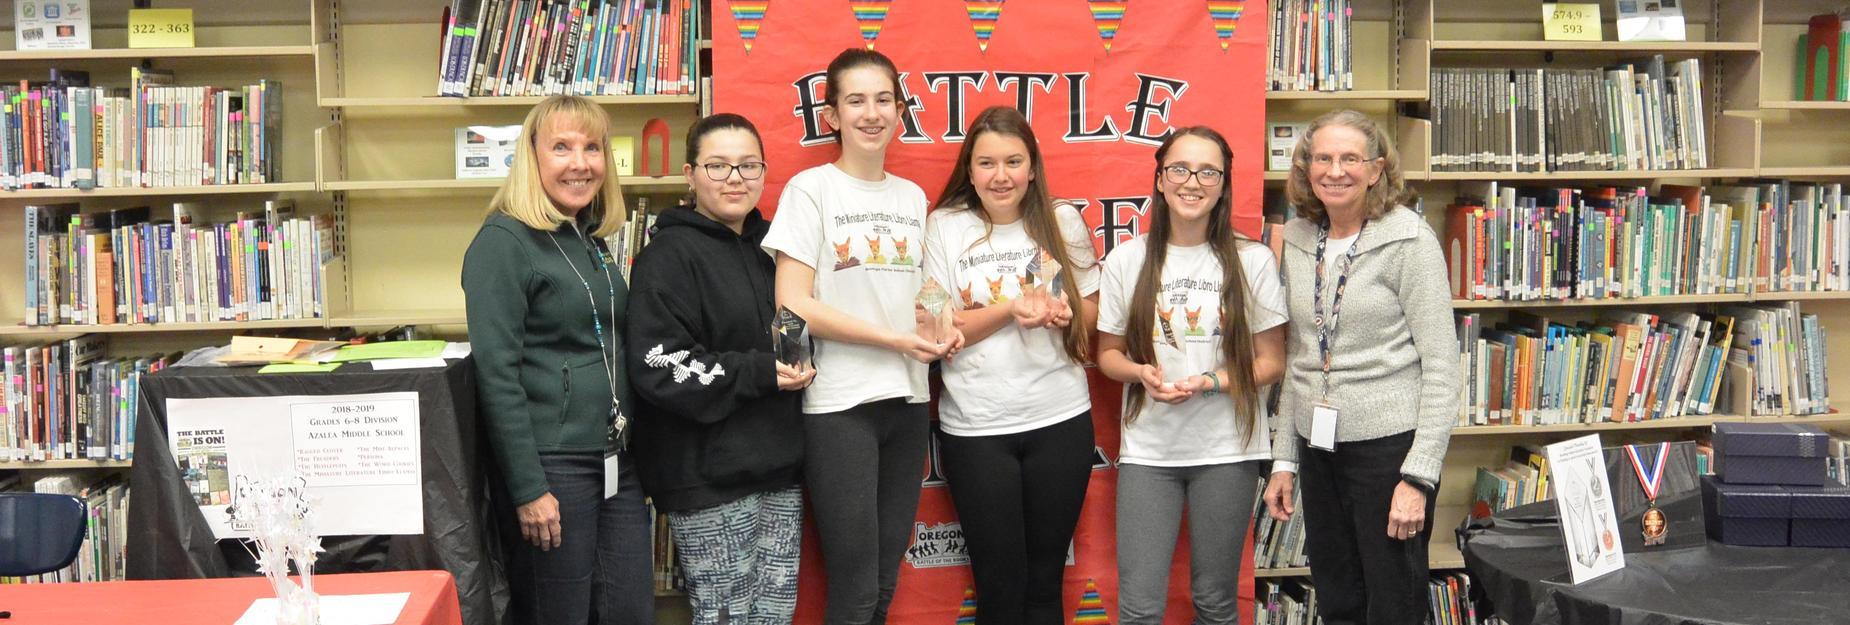 AMS Miniature Literature Libro Llamas headed to 'State'